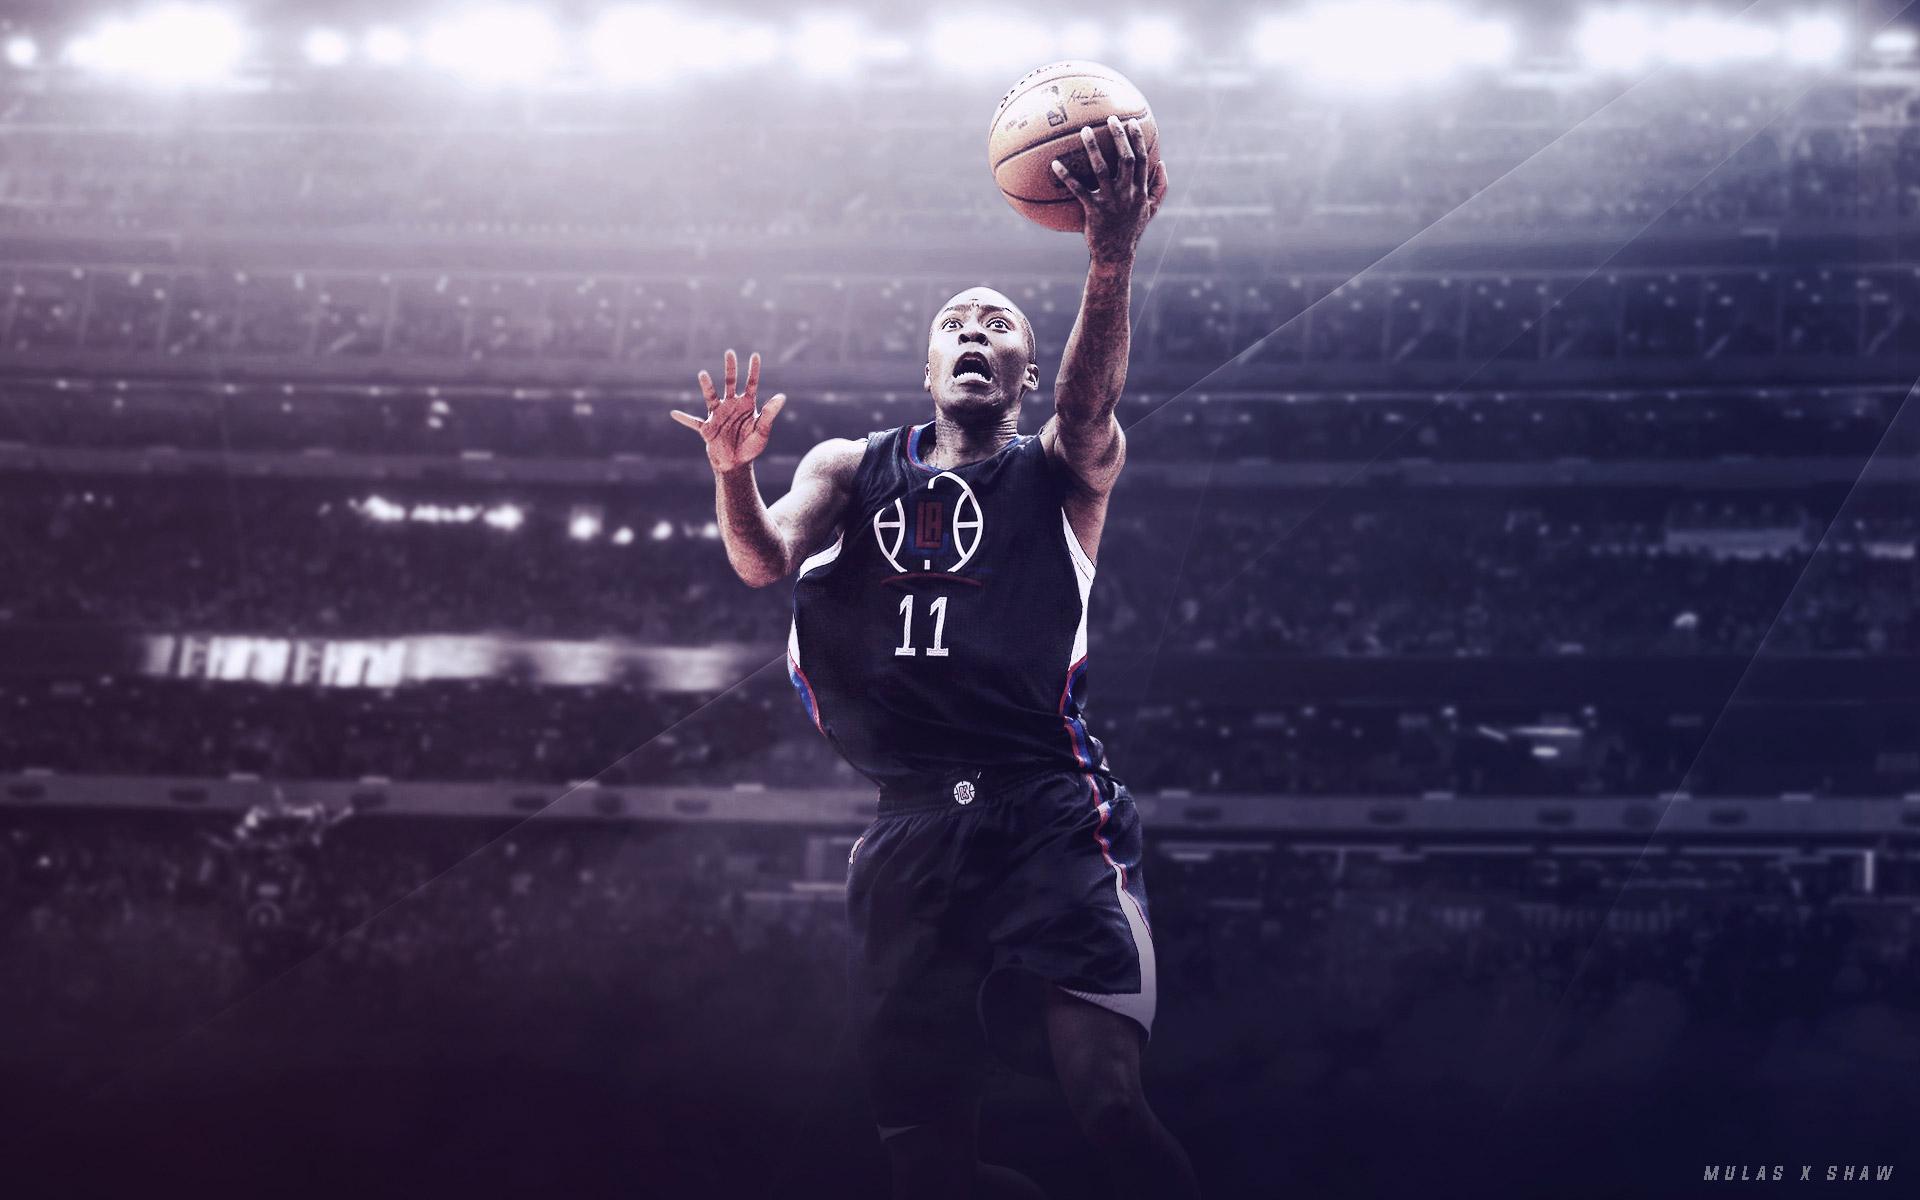 Jamal Crawford Clippers 2016 Wallpaper